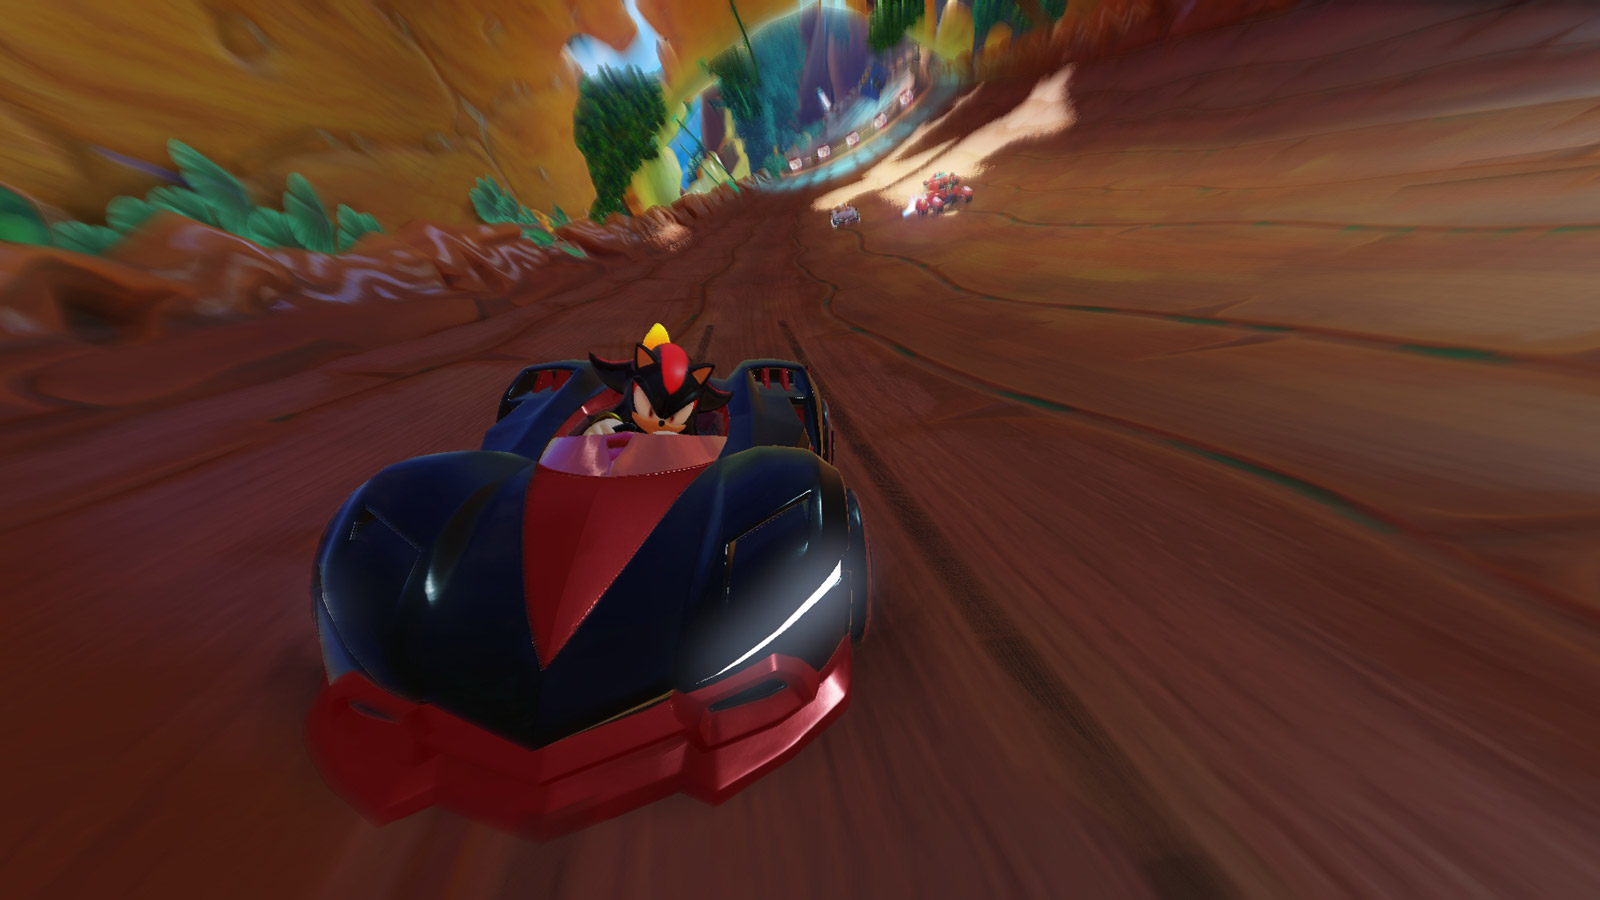 Free Team Sonic Racing Wallpaper in 1600x900